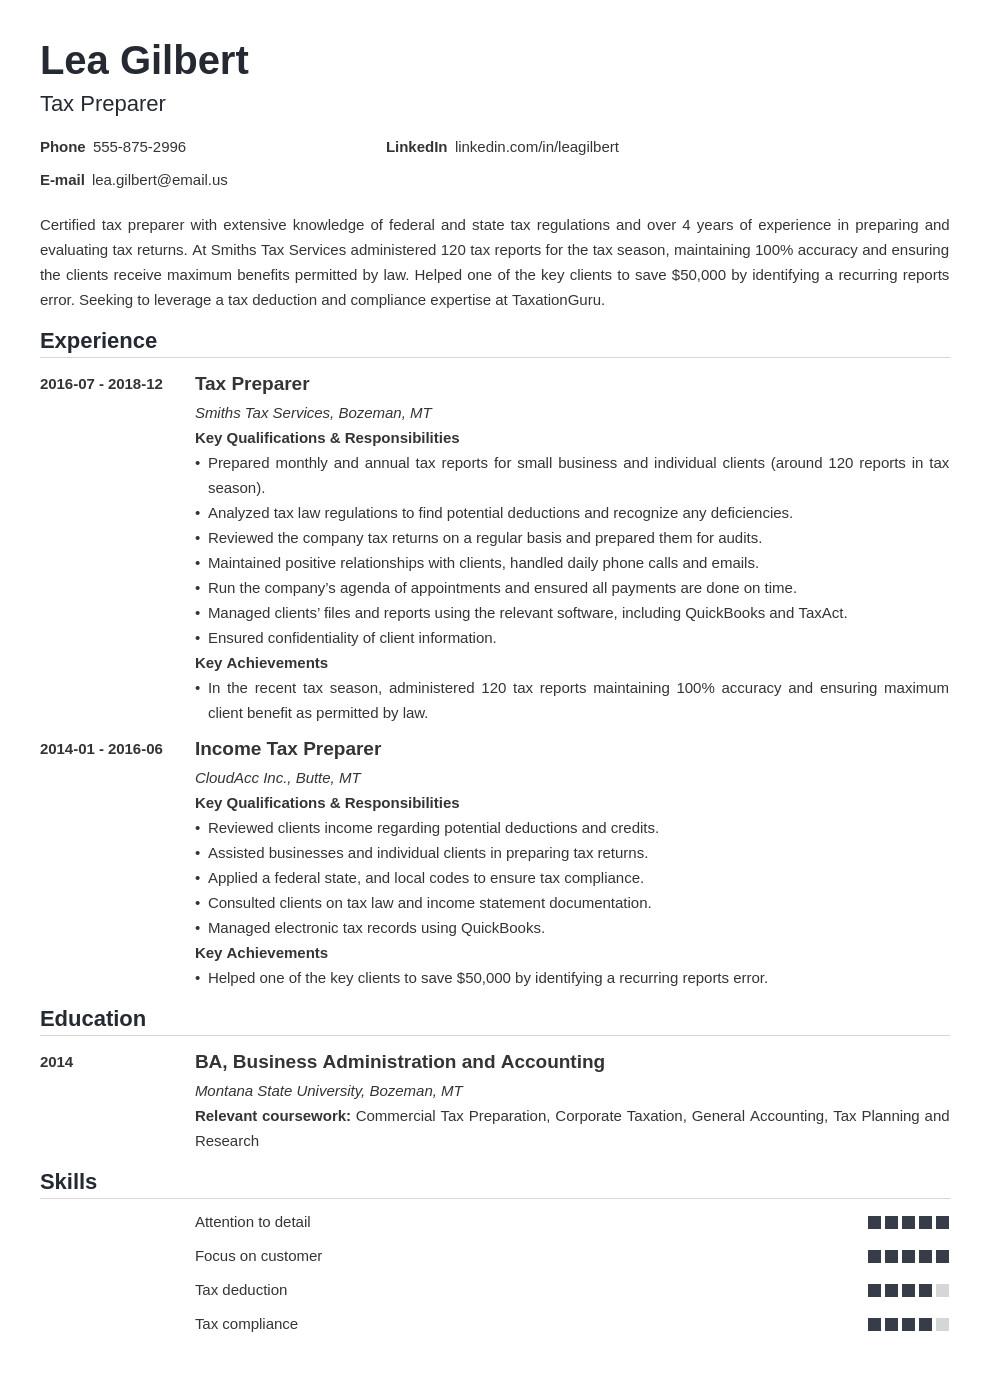 tax preparer resume example